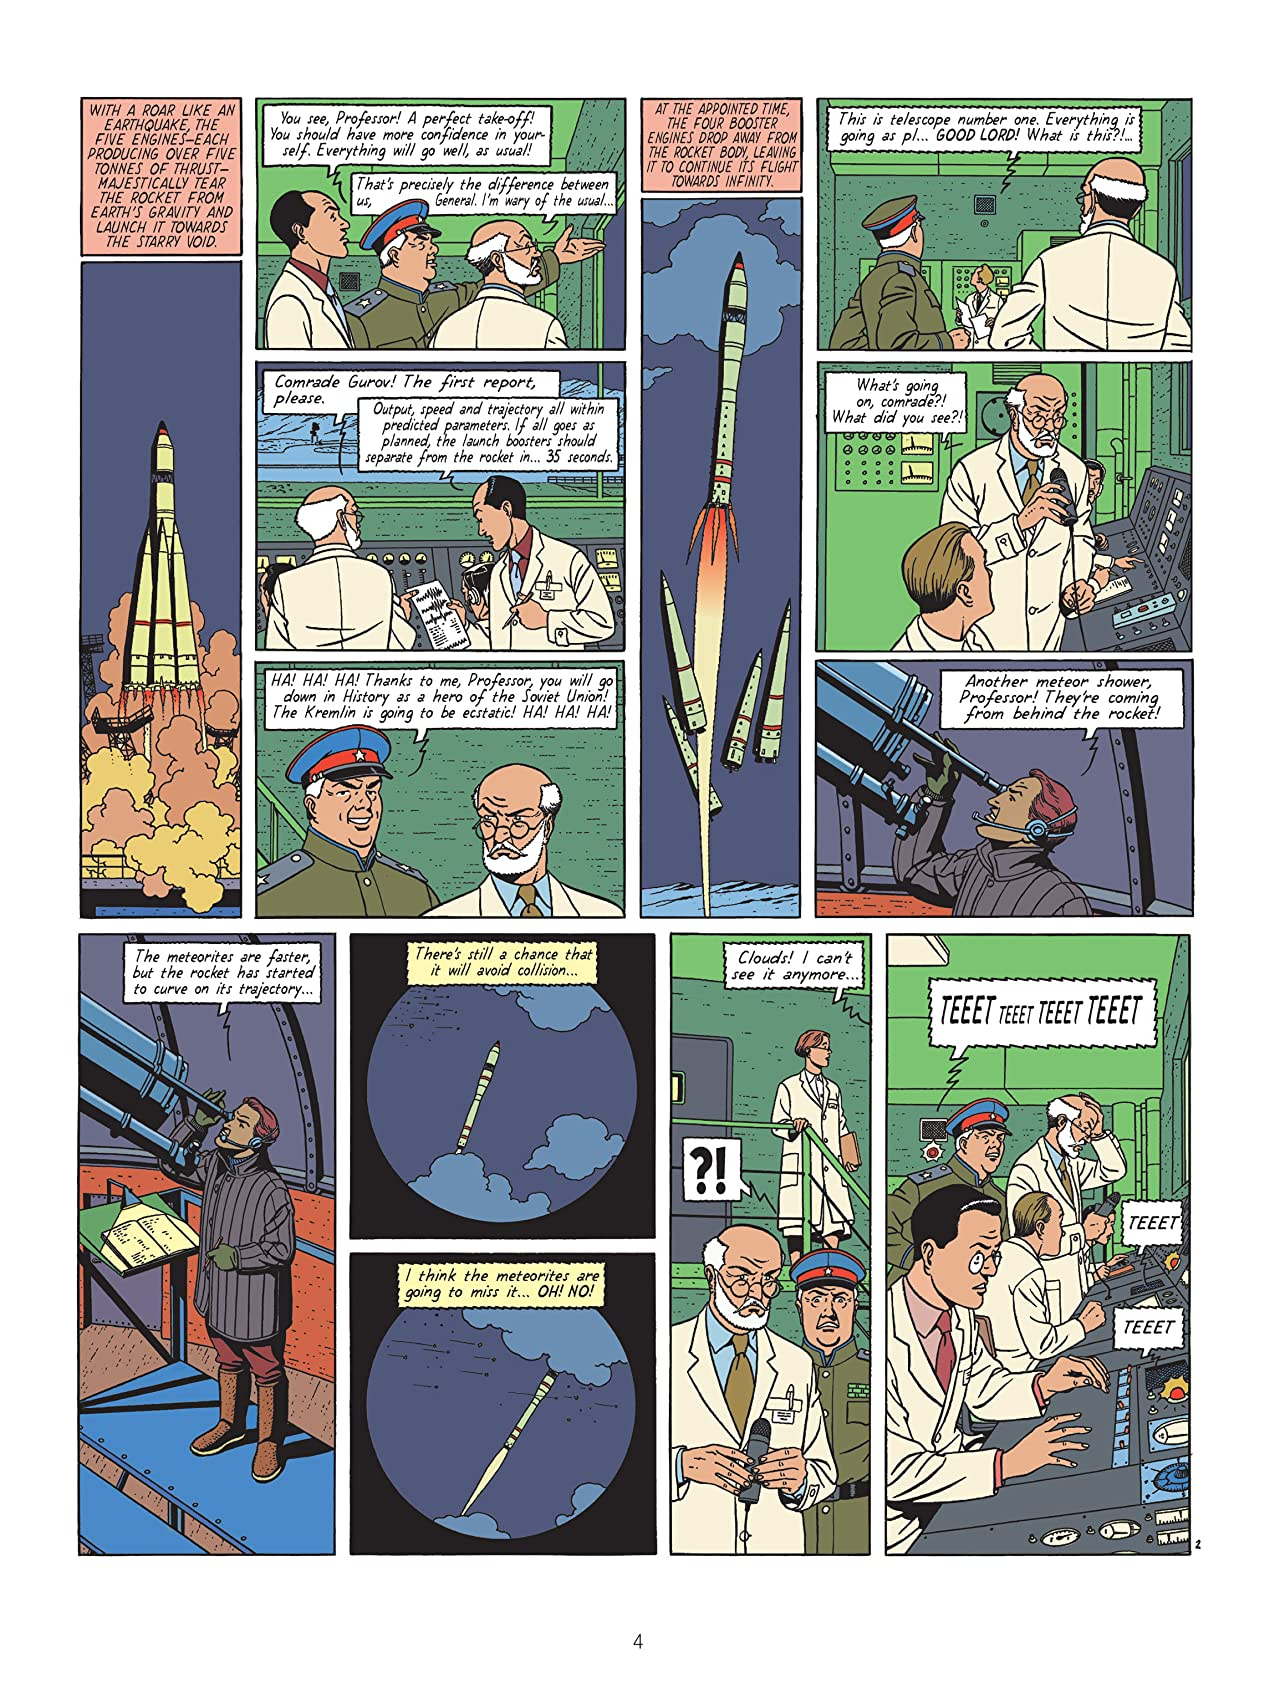 Blake & Mortimer Vol. 8: The Voronov Plot